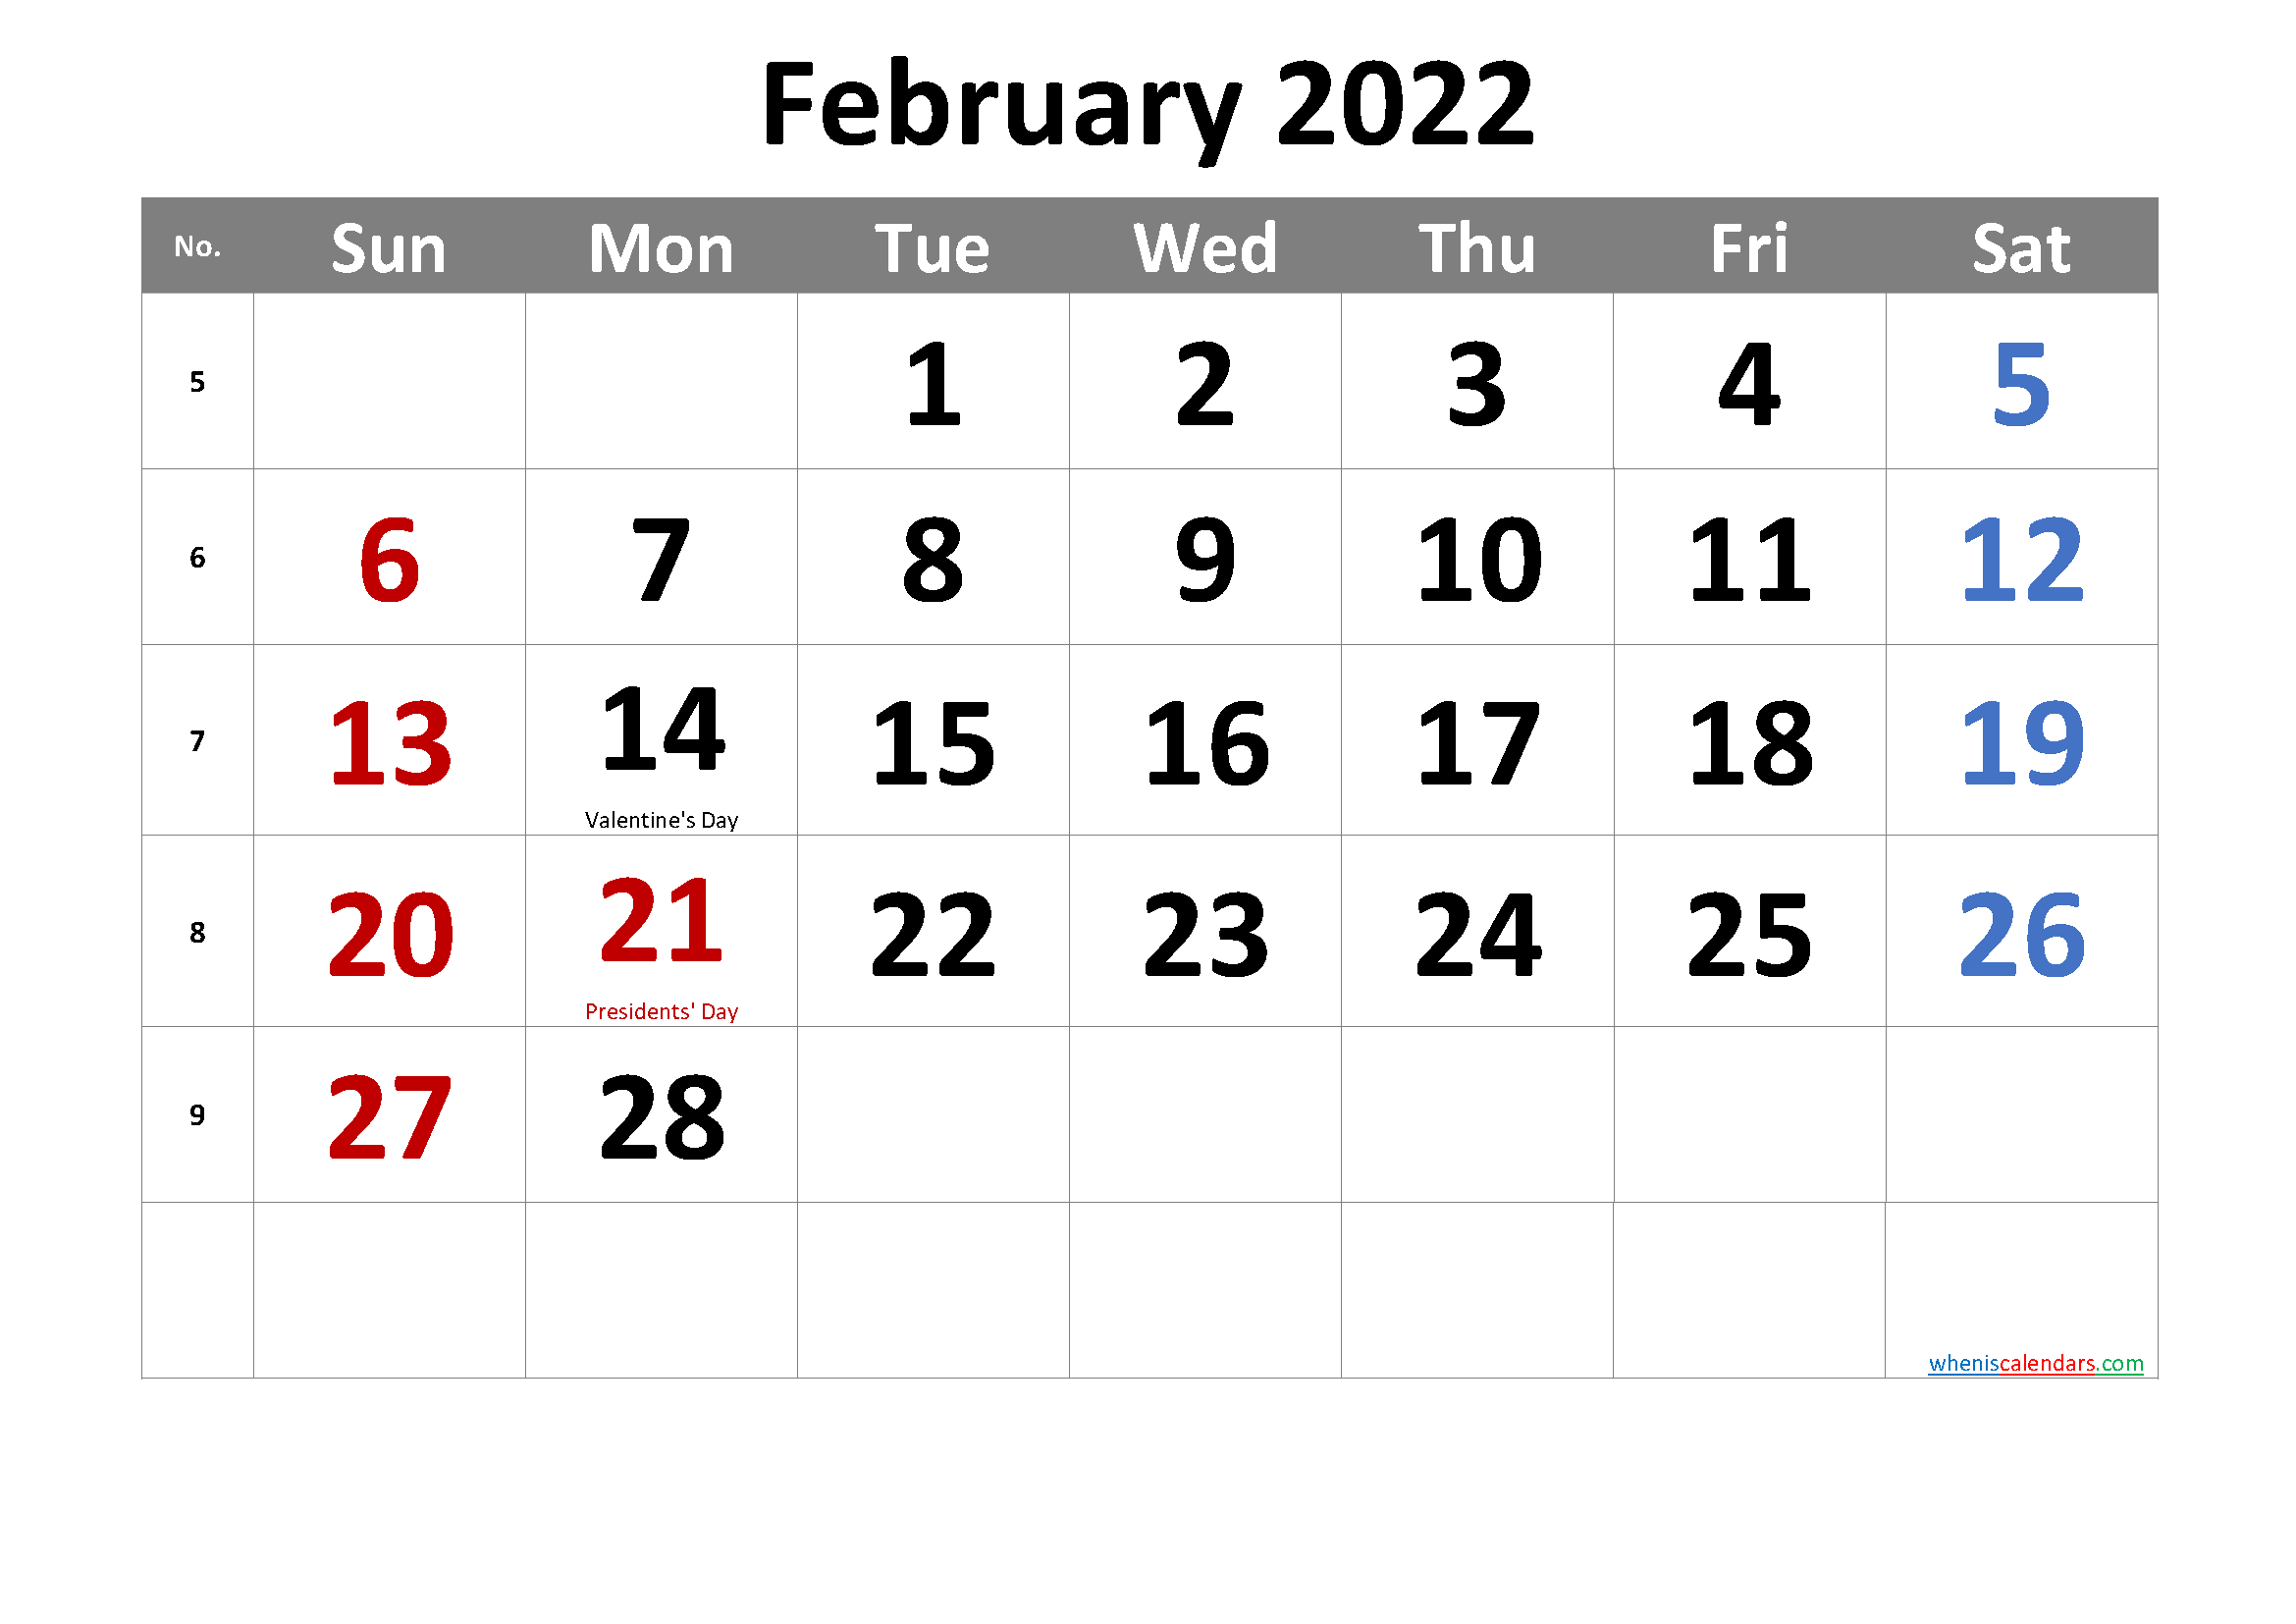 Free Printable February 2022 Calendar Throughout Printable Calendar February 2022